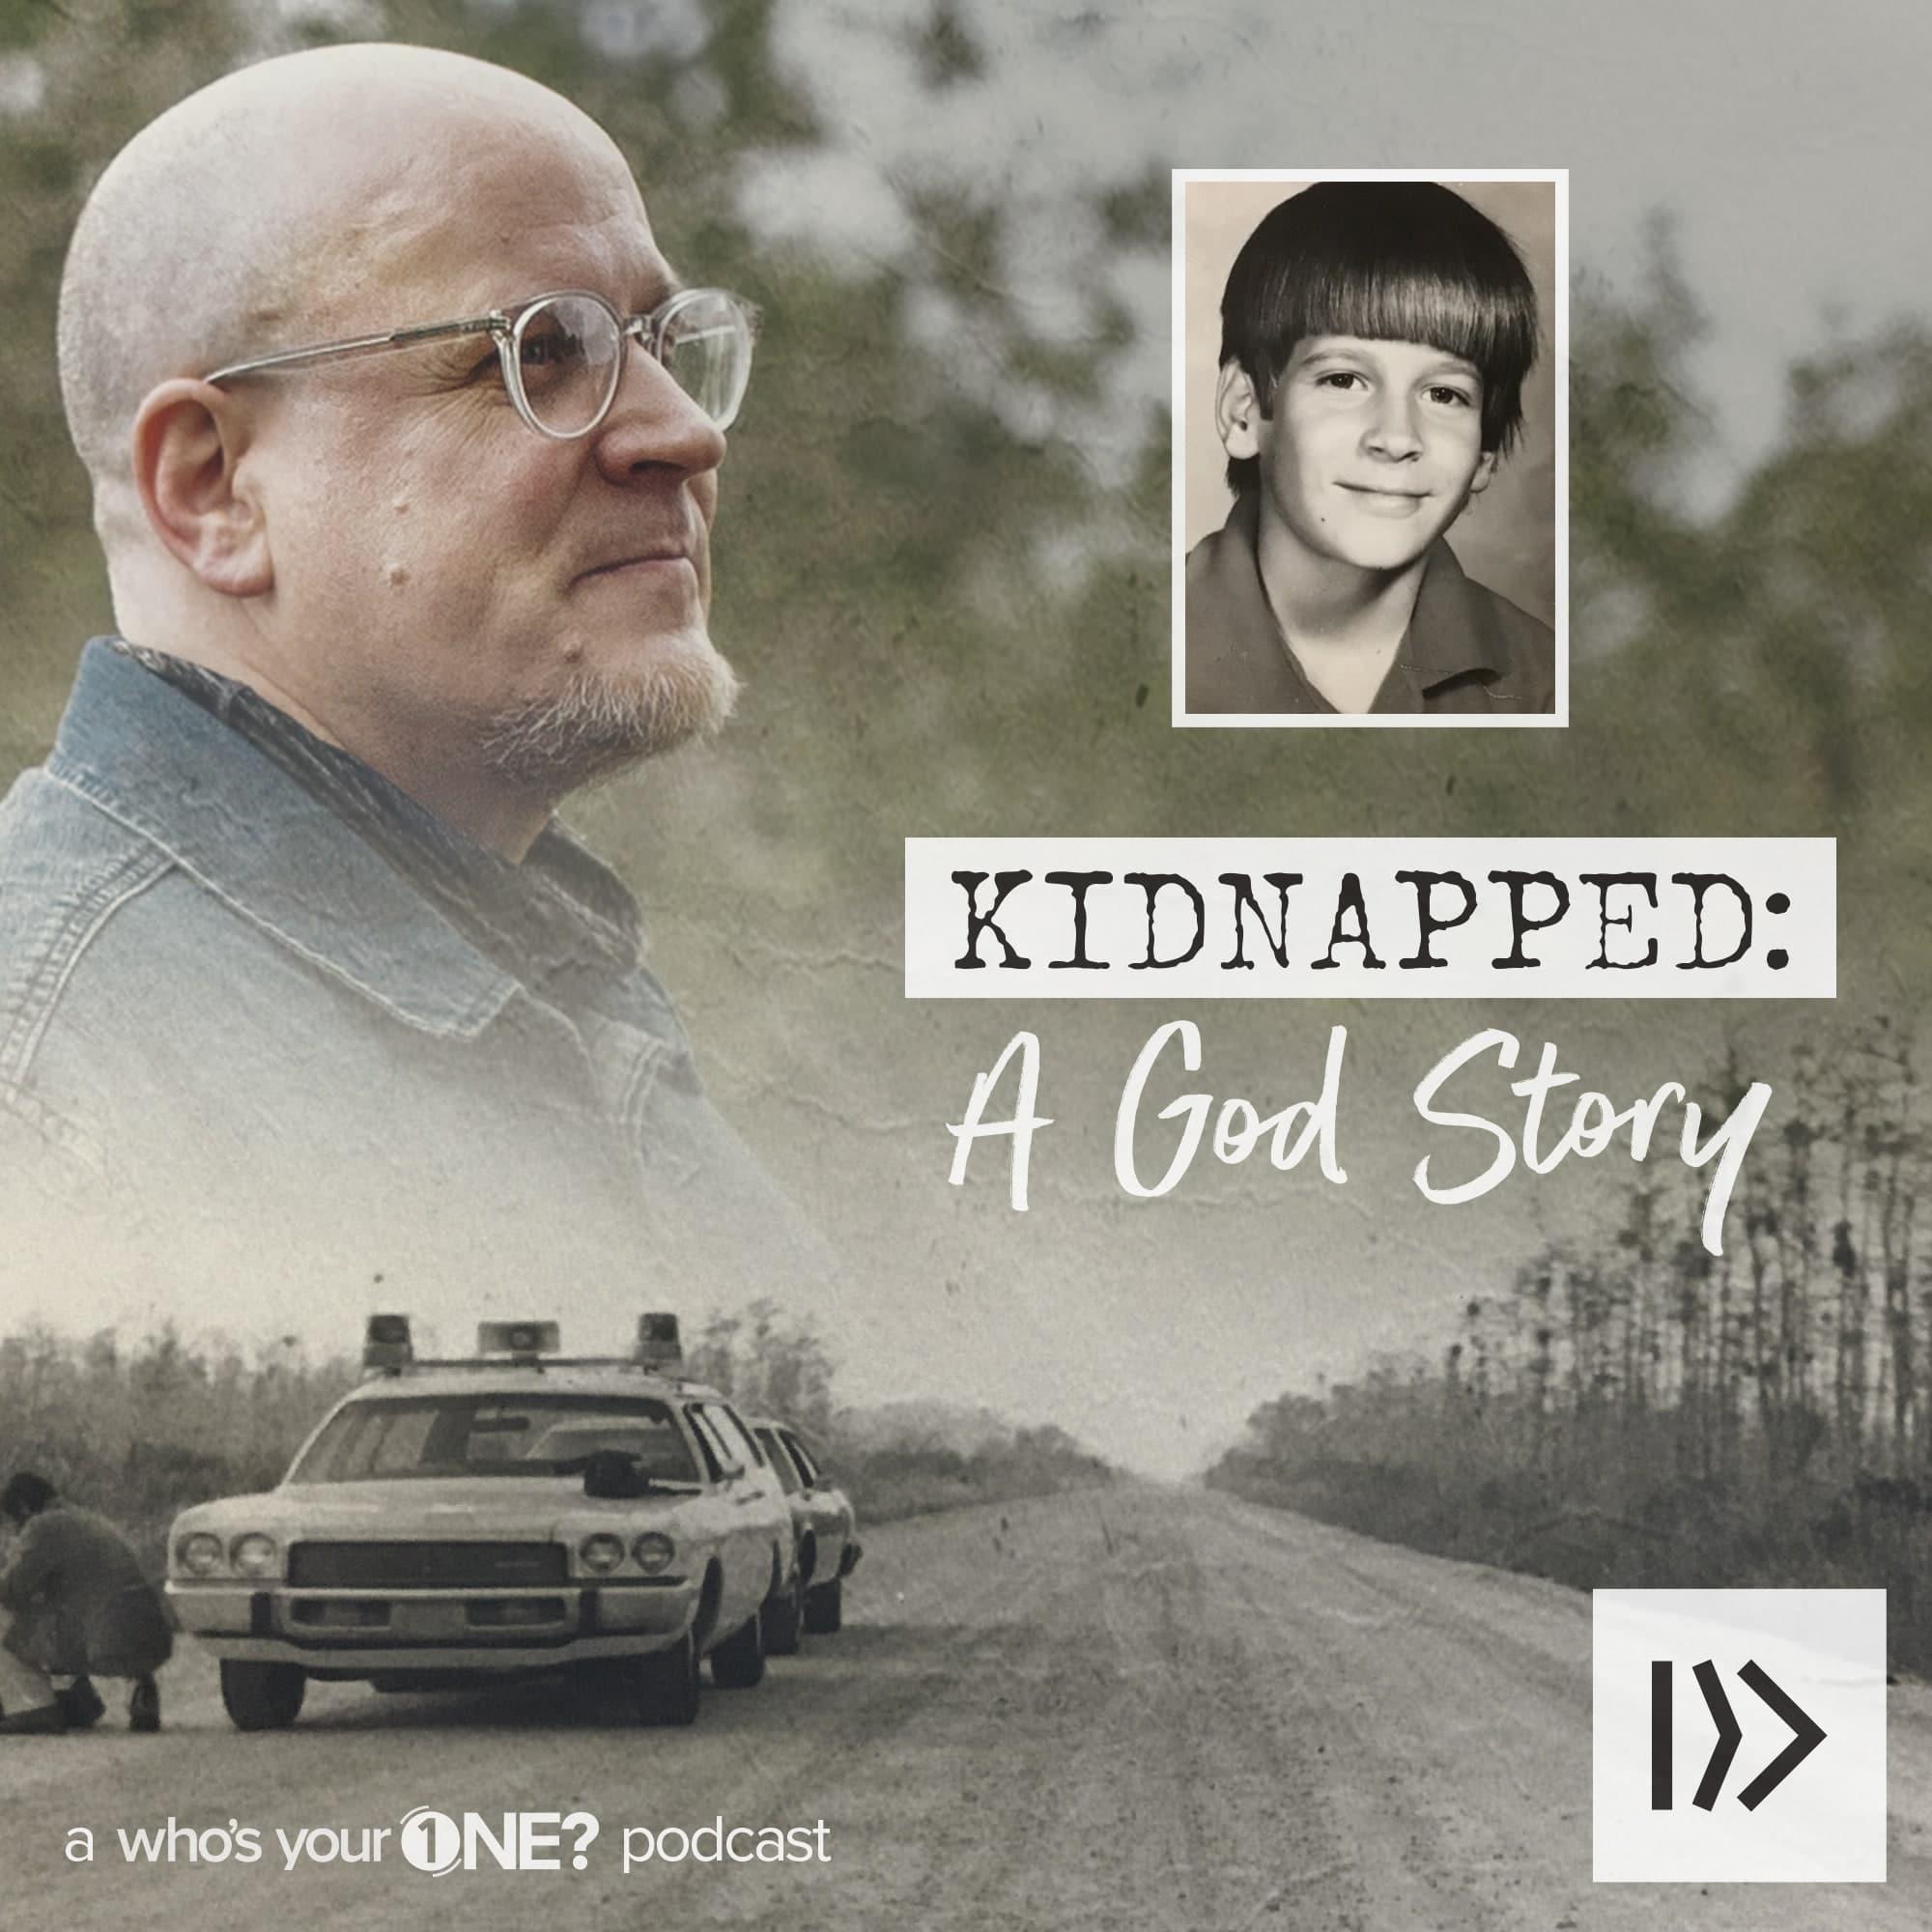 2104_Kidnapped_A God Story_Podcast_Art